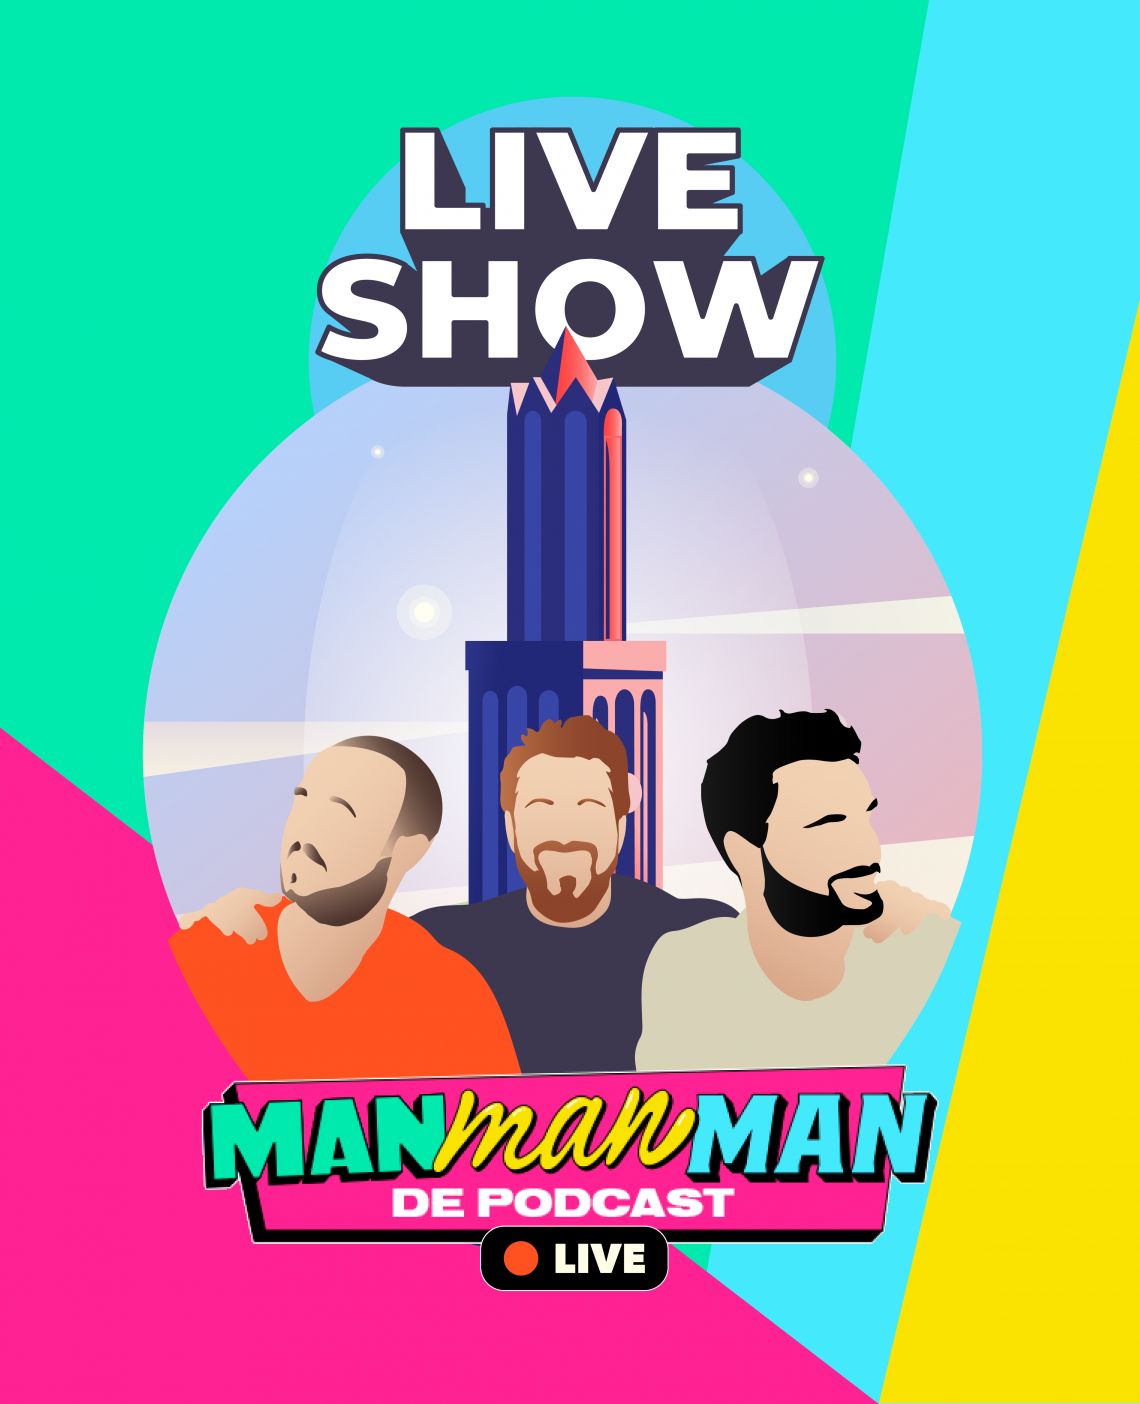 Man man man, de podcast live in de Dom